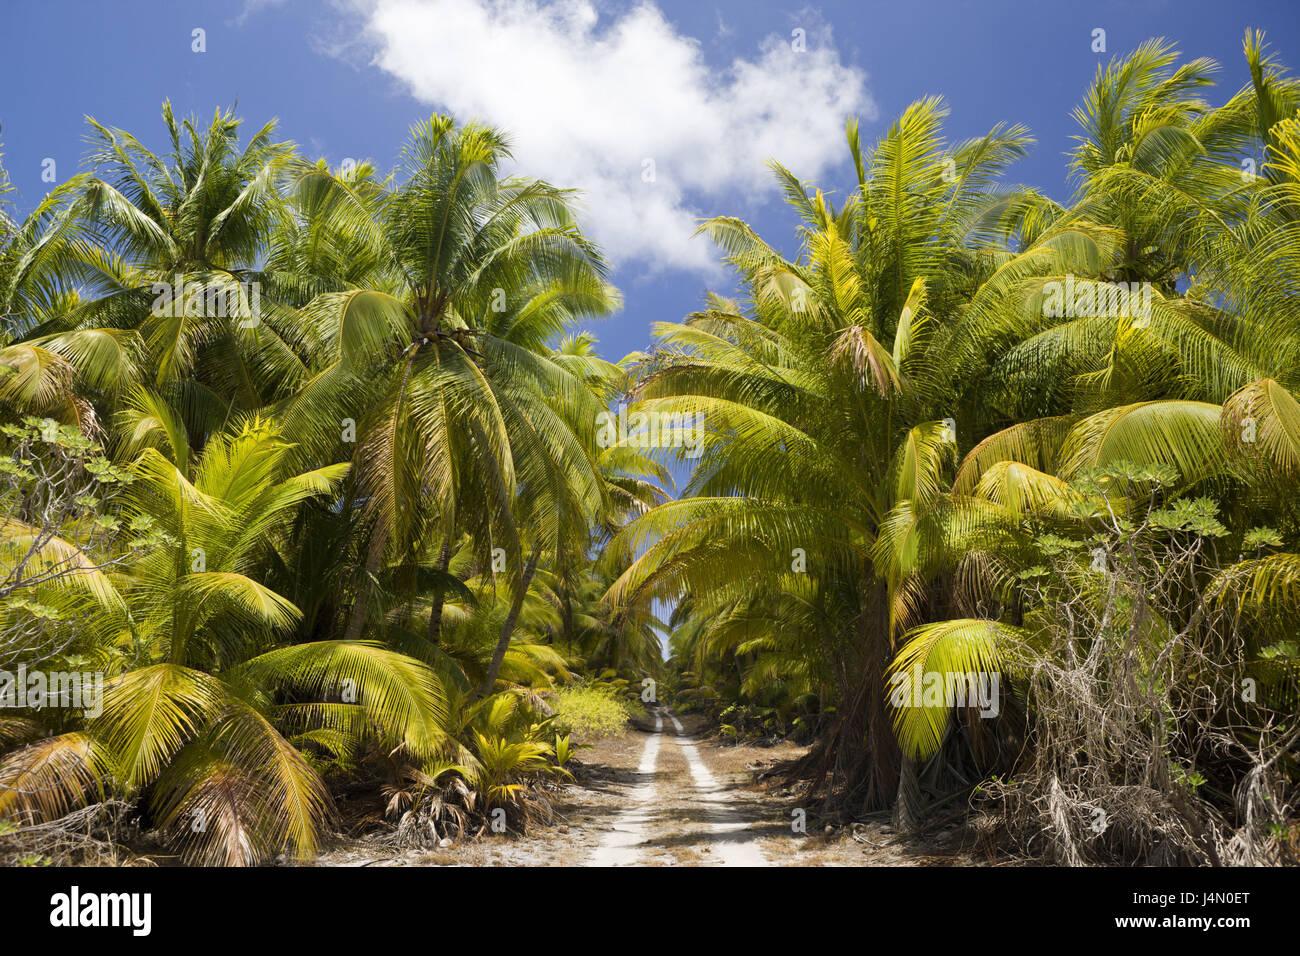 Coconut trees, Bikini, Marshall islands, - Stock Image